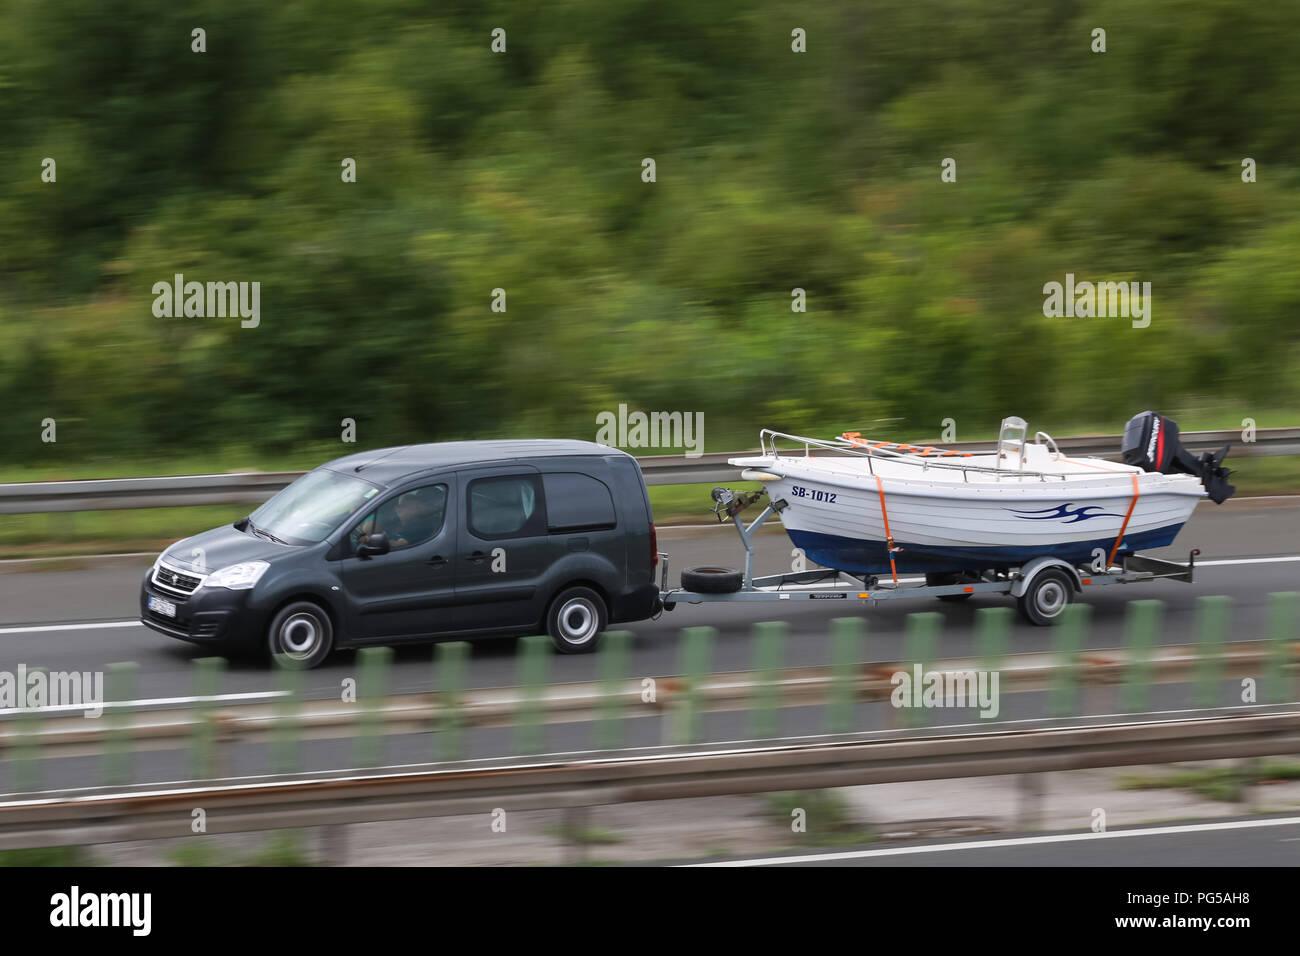 Zagreb, Croatia - August 11th, 2018 : Close up of speeding car on the Zagreb motor way bypass in Zagreb, Croatia. Stock Photo